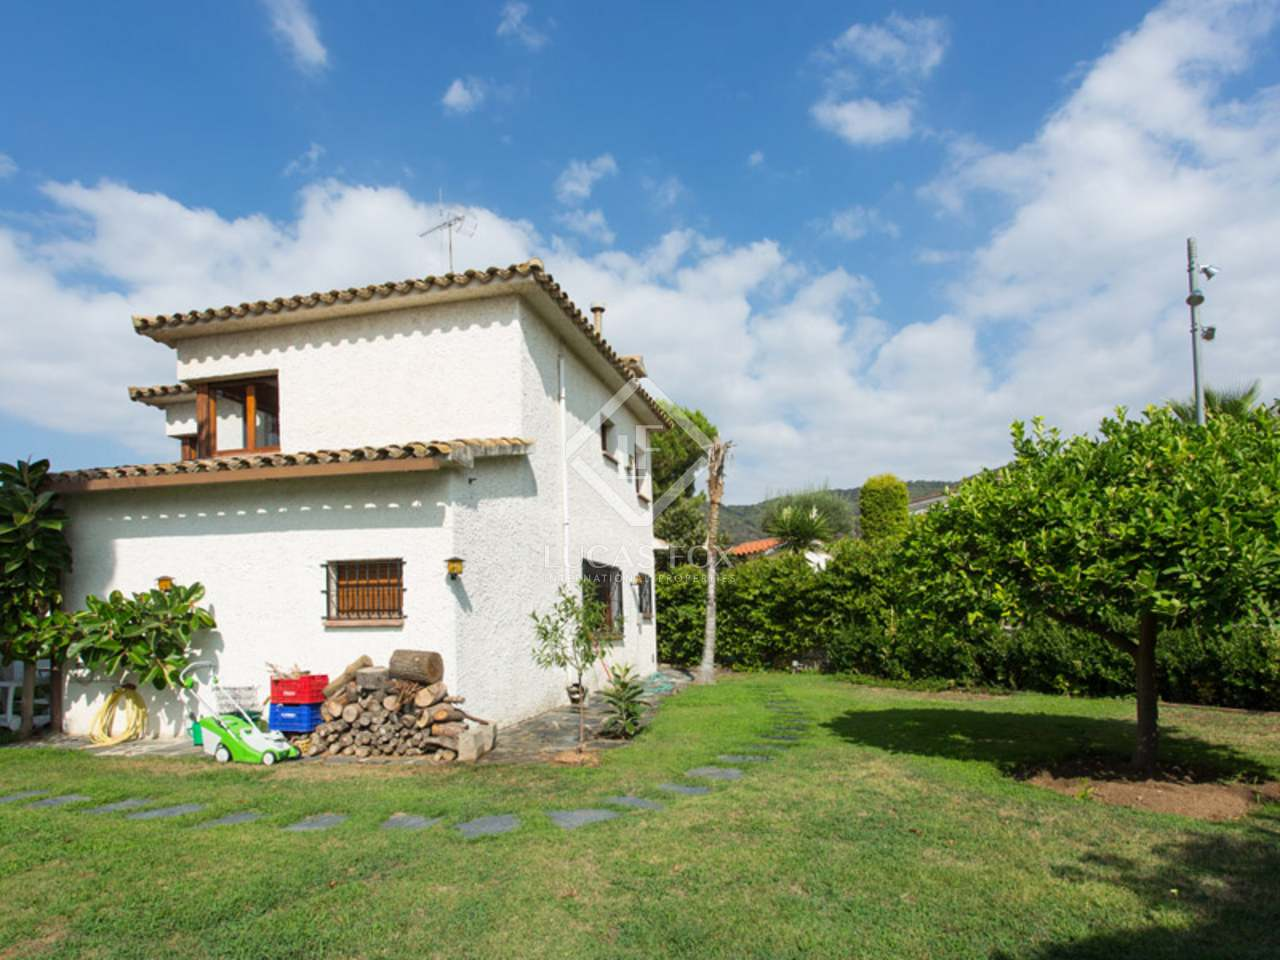 5 Bedroom House For Sale In Premia De Dalt